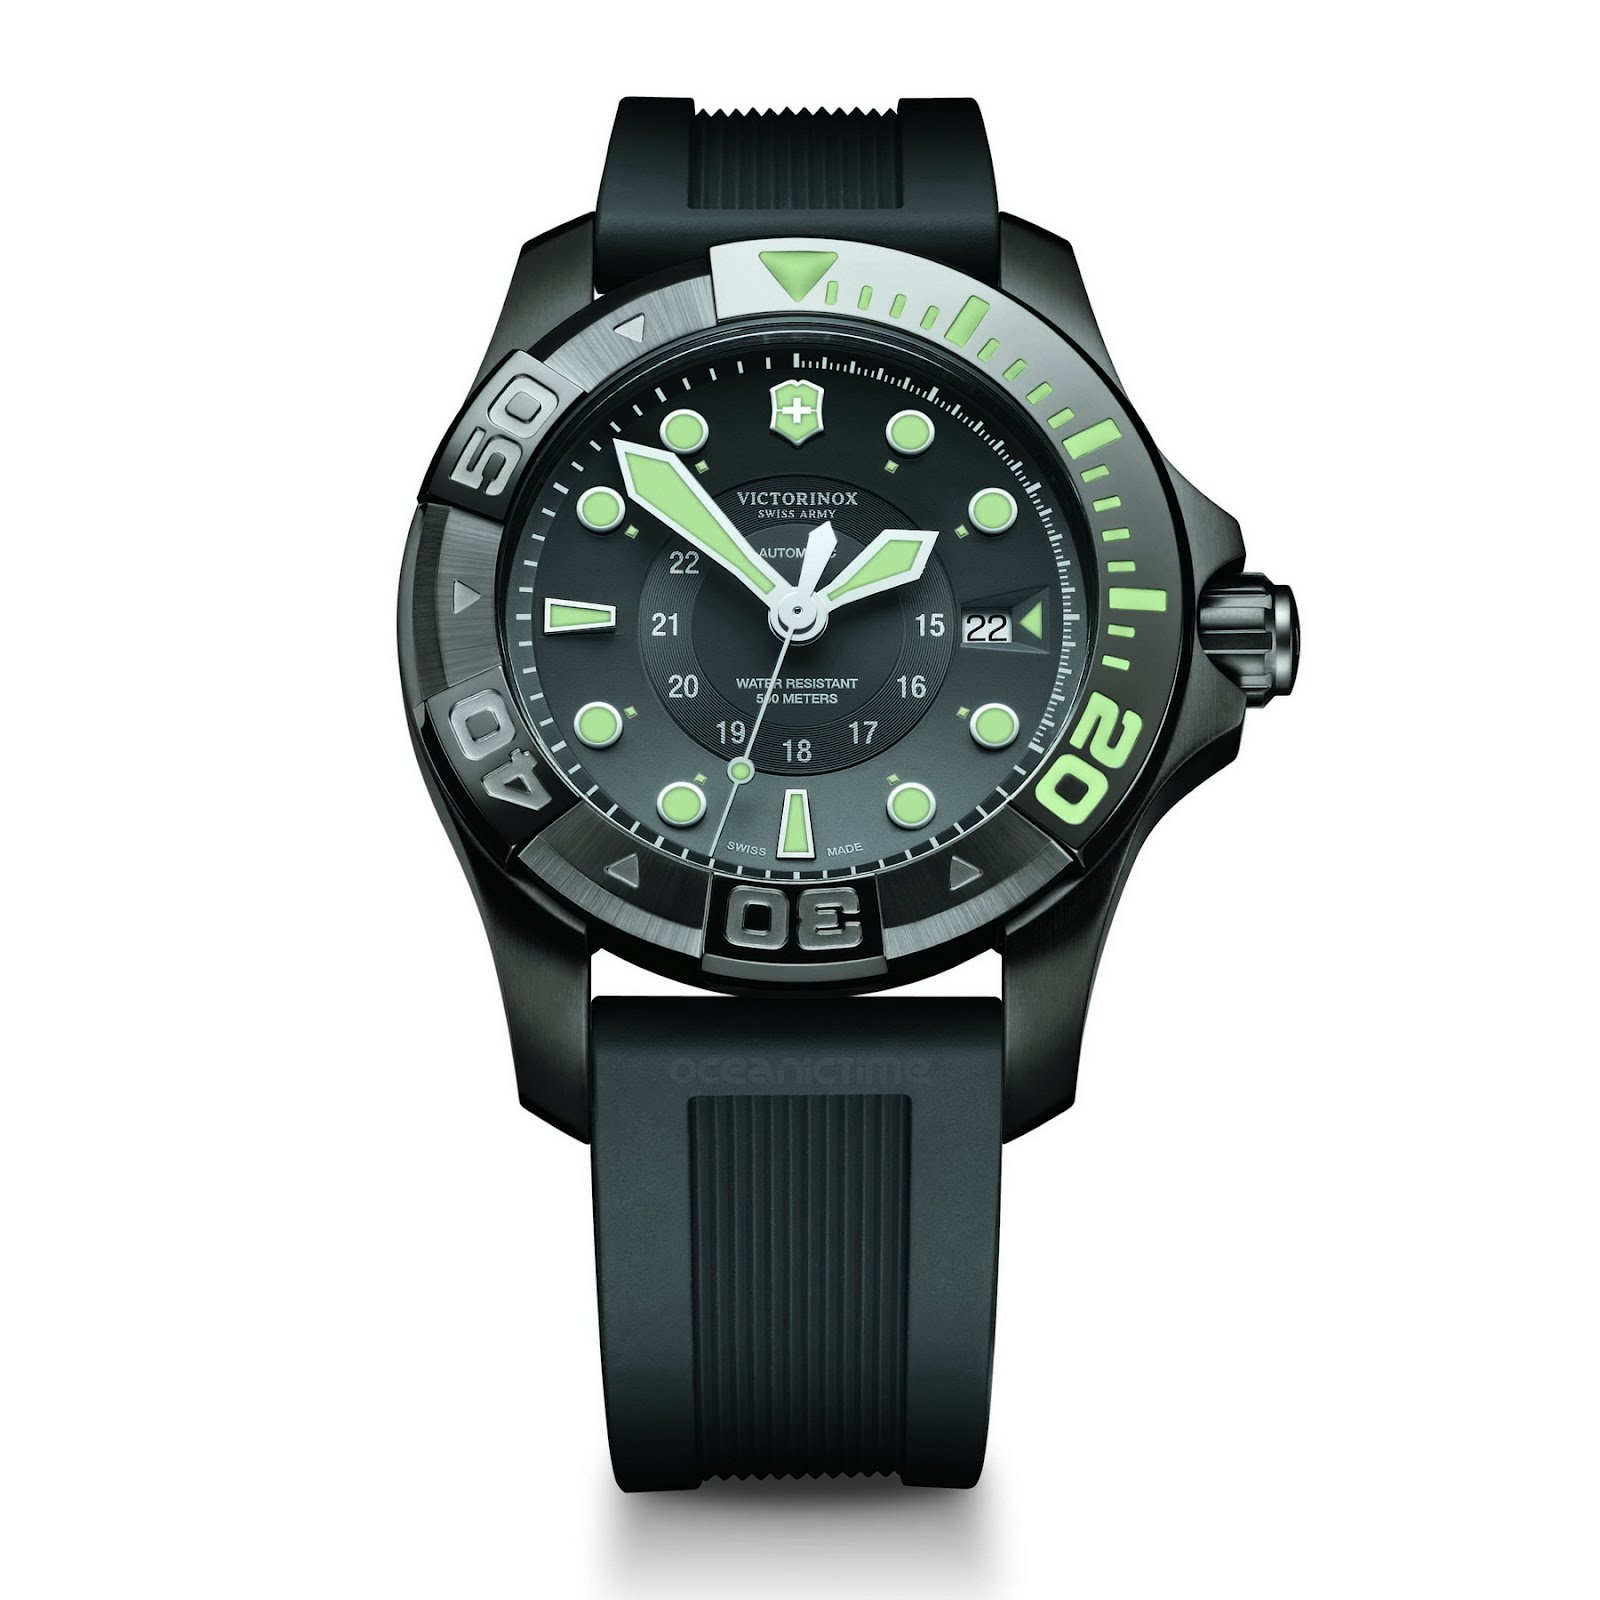 Victorinox Dive Master 61